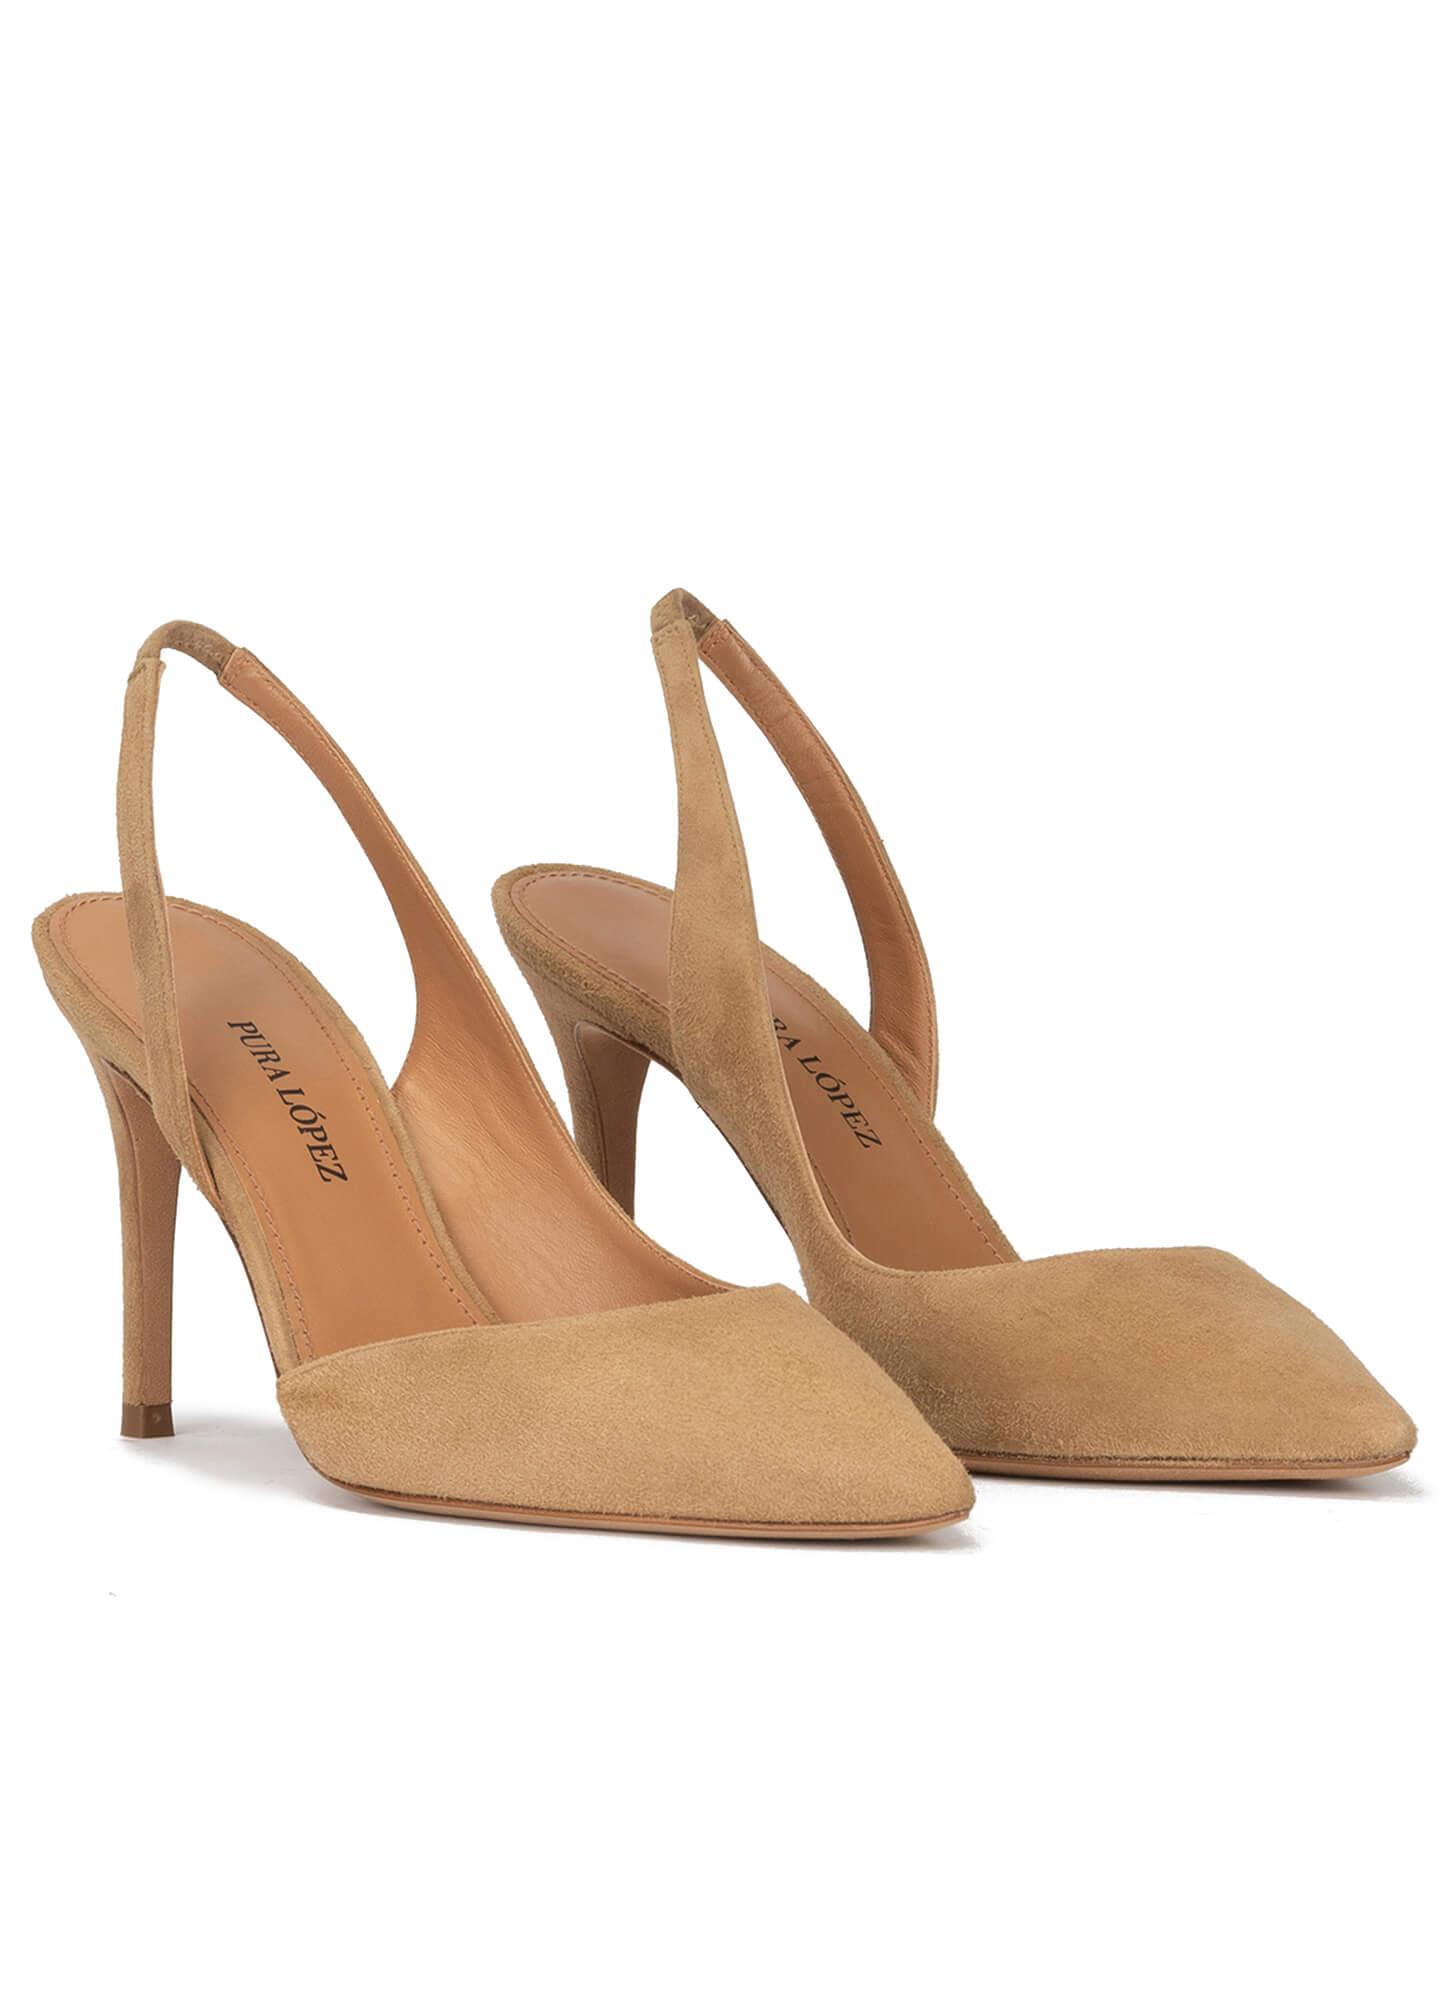 Slingback pointy toe stiletto heel